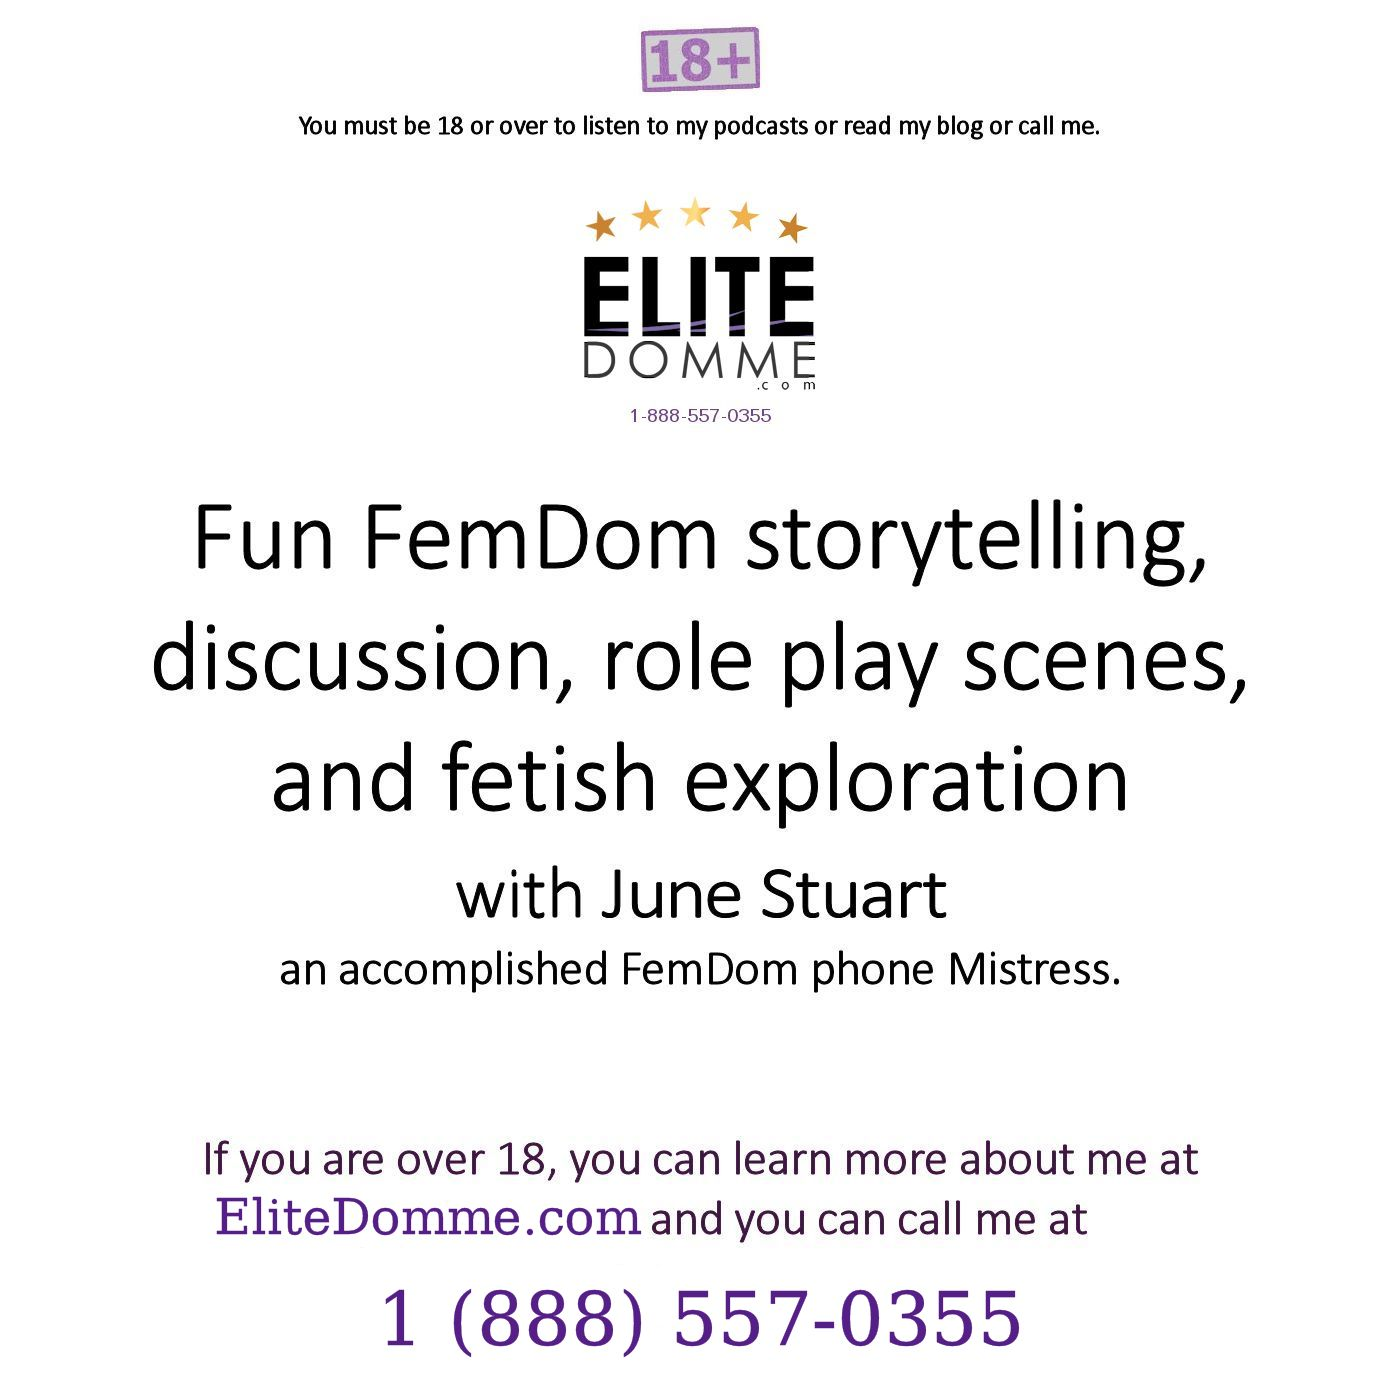 EliteDomme.com – Intelligent phone sex with a fun FemDom Mistress